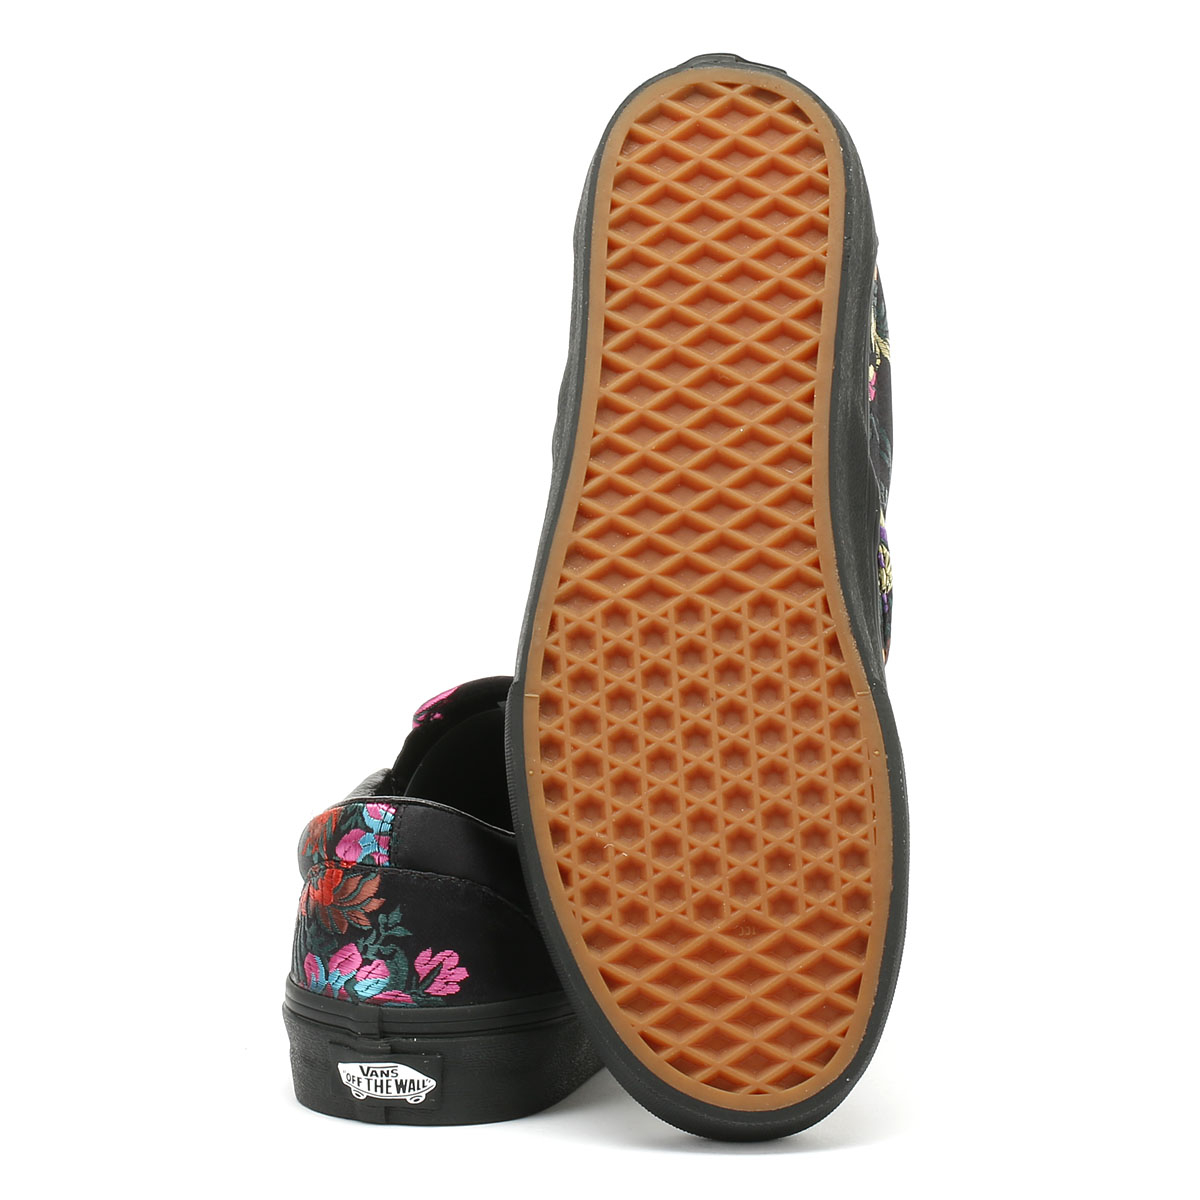 8e9b4c3df9 Vans Classic Slip on Festival Satin Womens Black Trainers Casual Skate Shoes